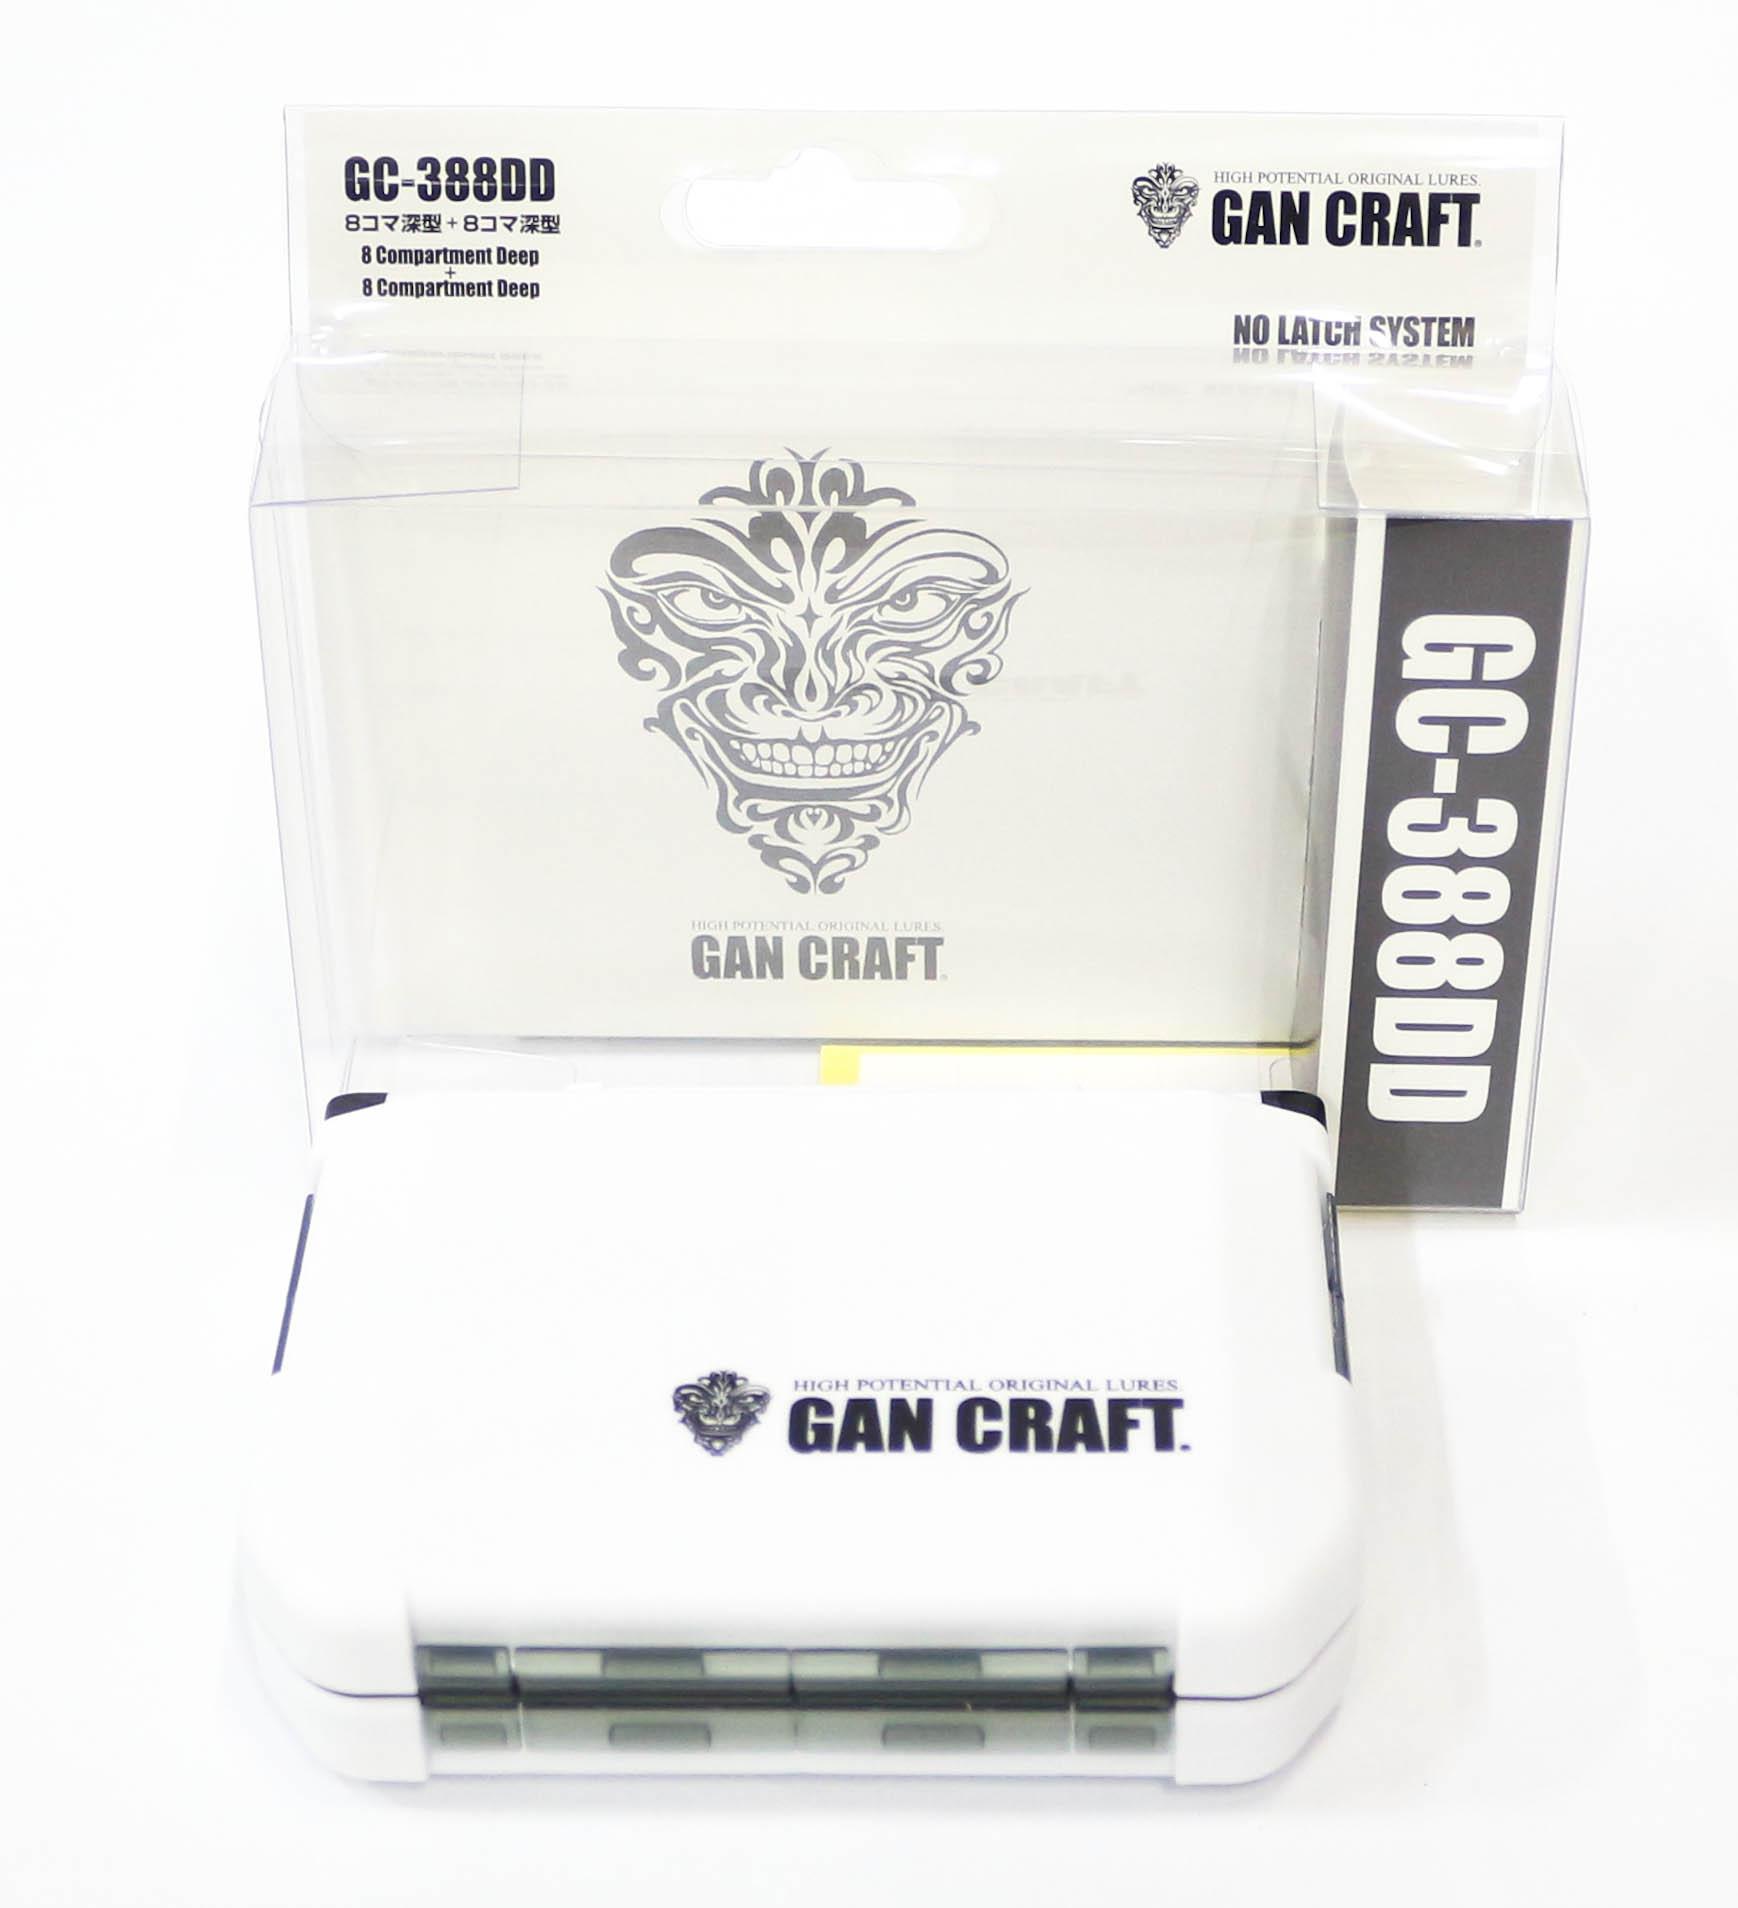 Gan Craft GC-388DD Tackle Lure Box Case 122 x 87 x 34 mm White (8915)